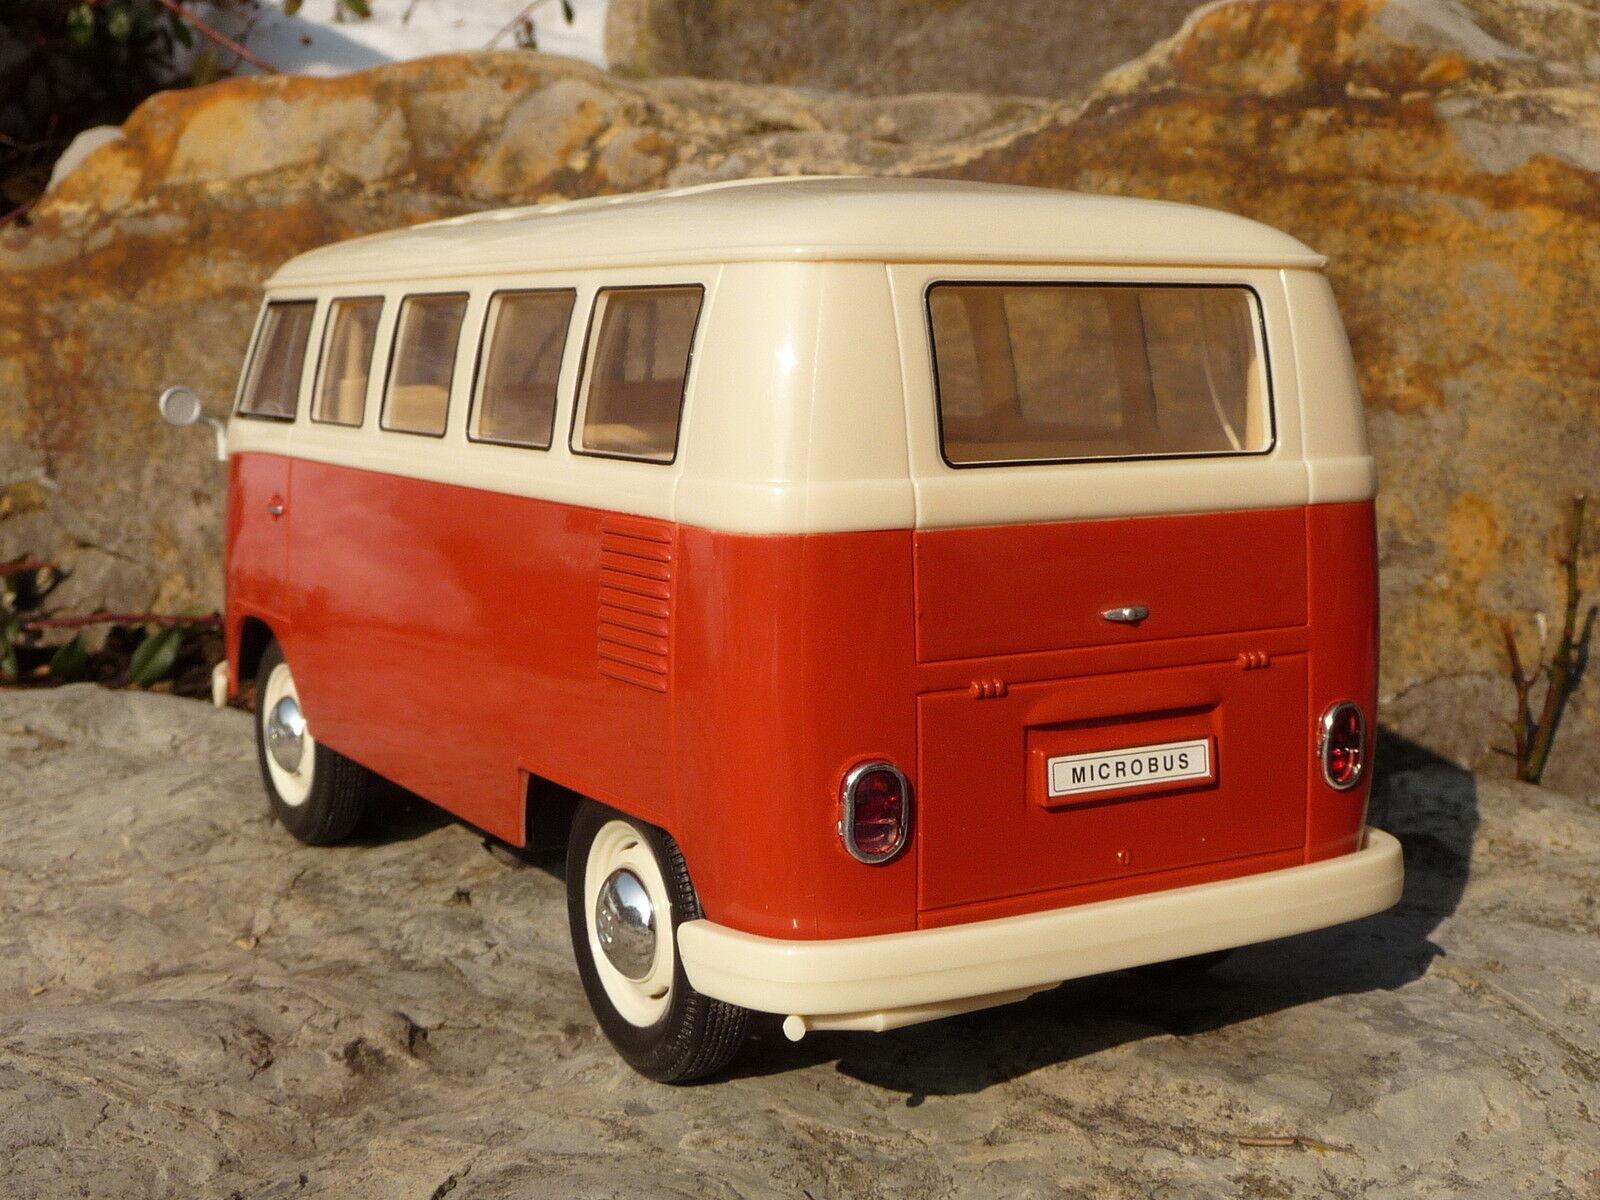 Modelo RC furgoneta VW t1 Classic longitud 26cm por control remoto 27mhz 400120